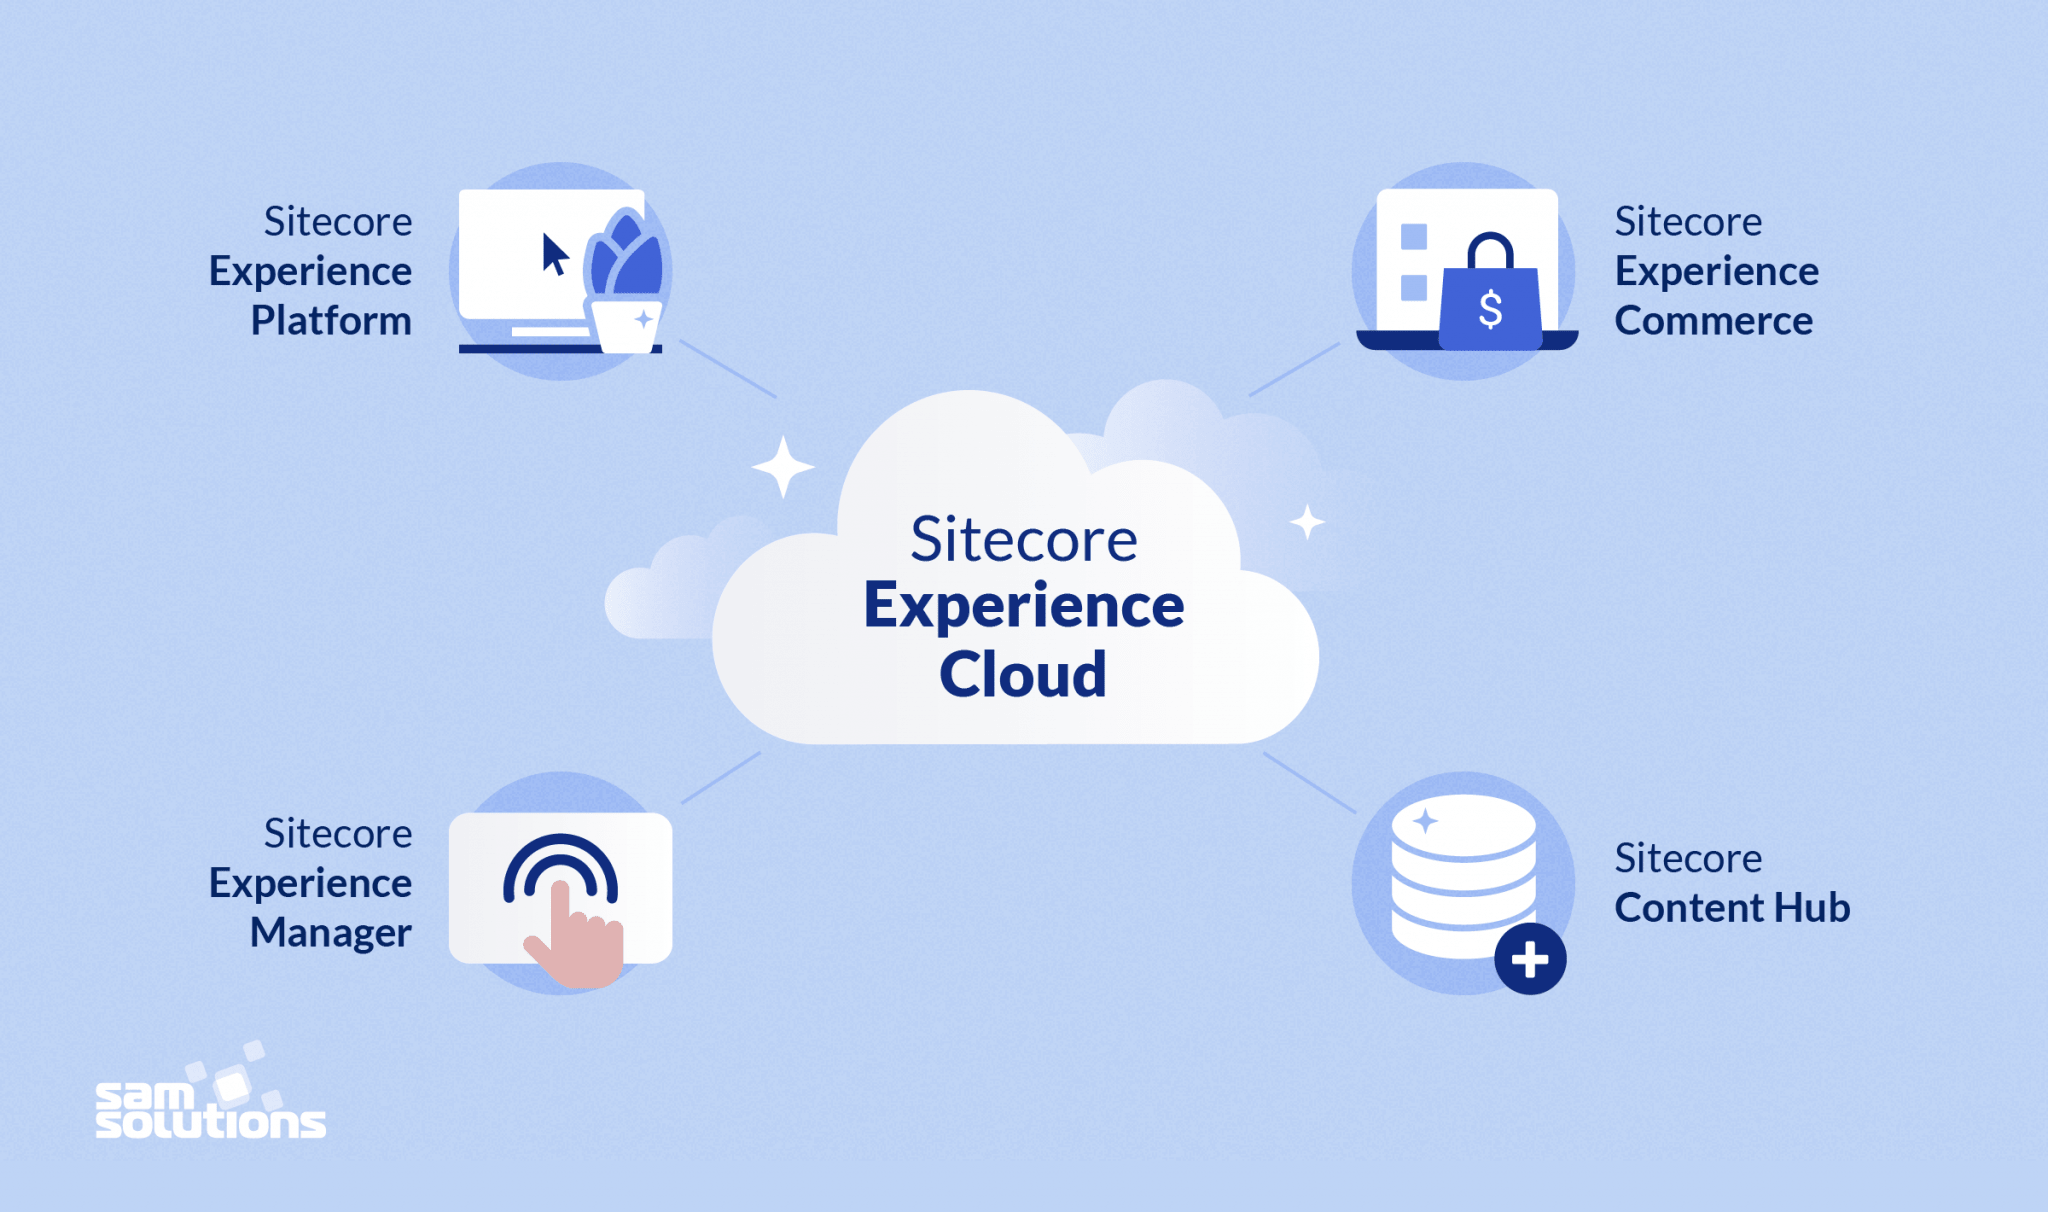 Sitecore-Experience-Cloud-components-image